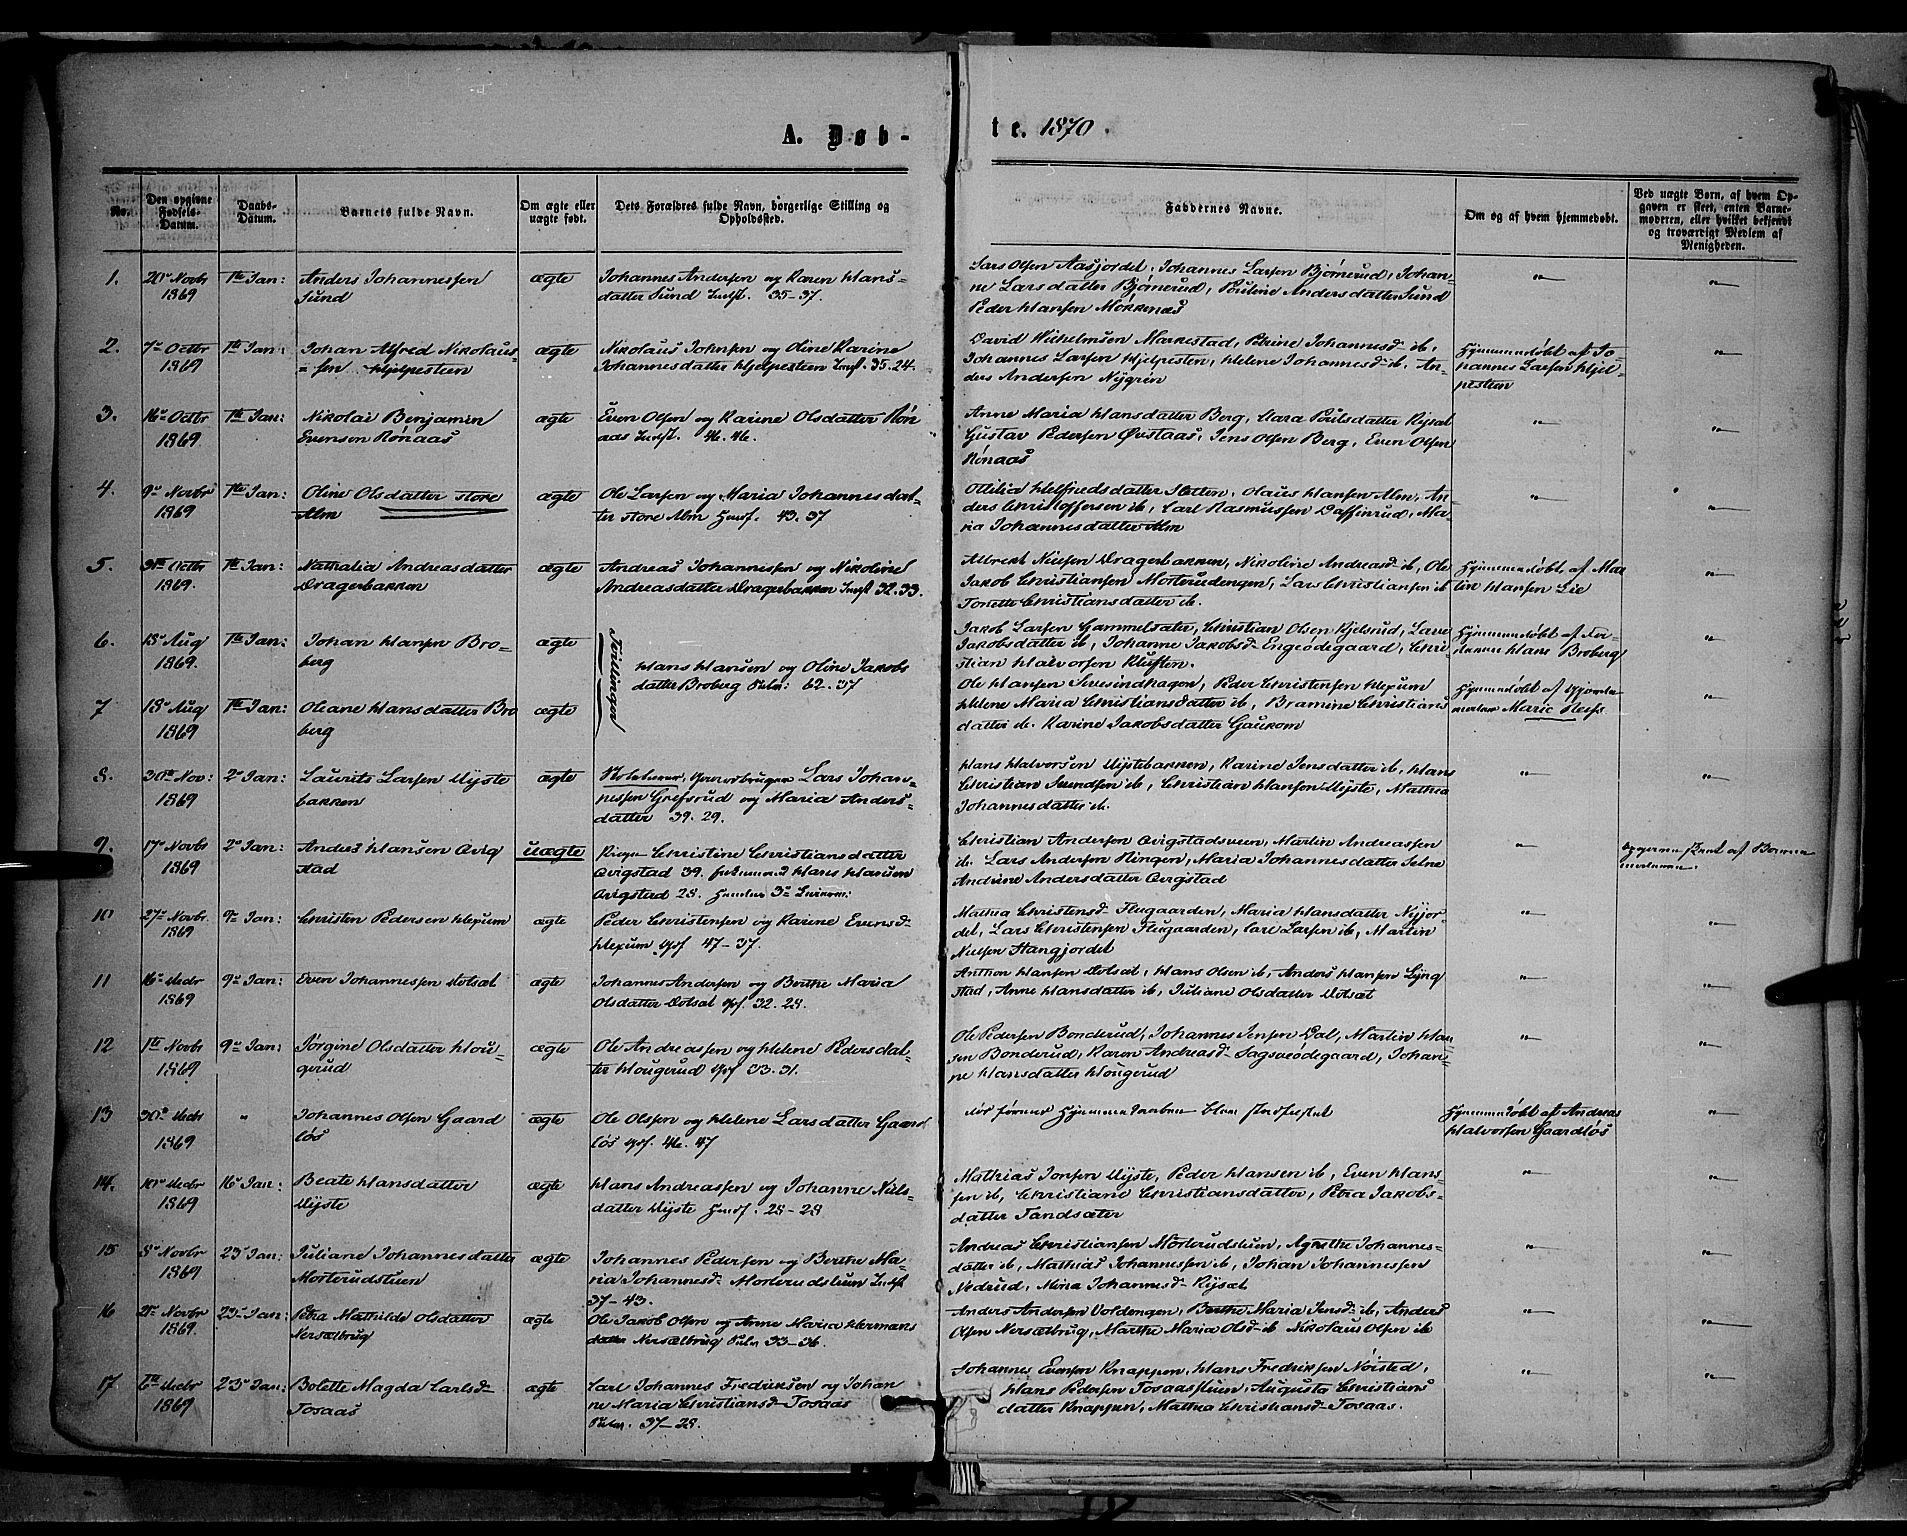 SAH, Vestre Toten prestekontor, H/Ha/Haa/L0008: Ministerialbok nr. 8, 1870-1877, s. 1